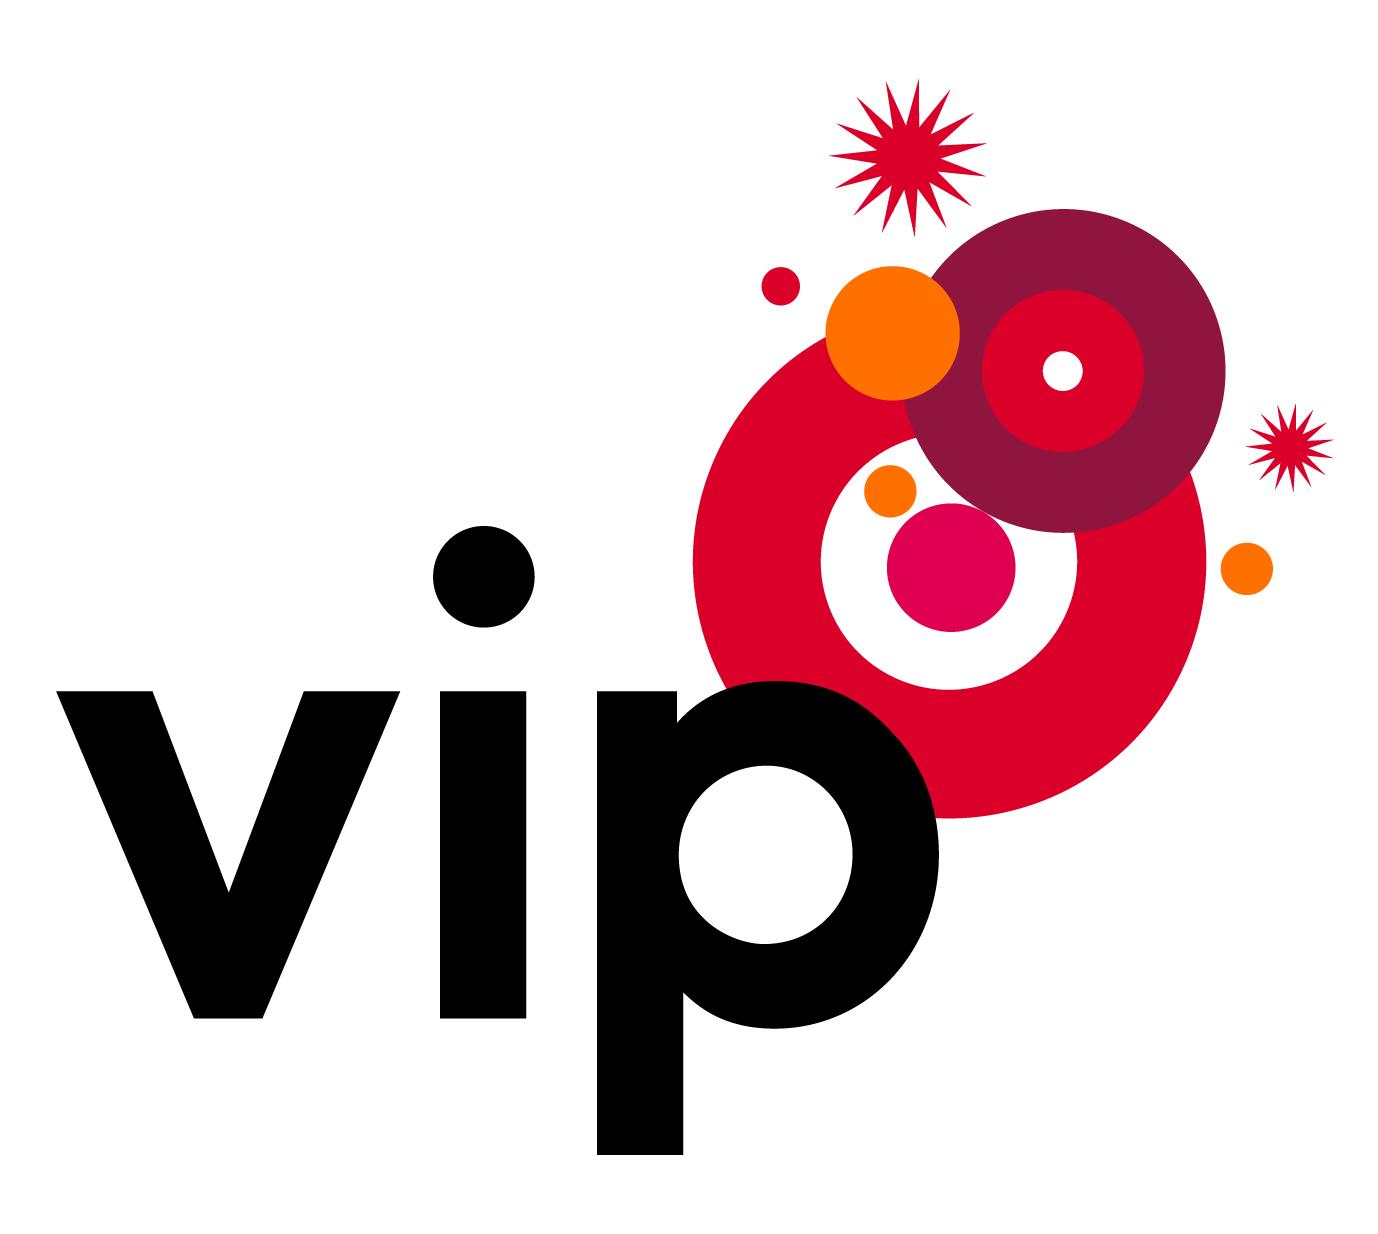 Croatia's Vipnet 2016 EBITDA rises on higher revenues